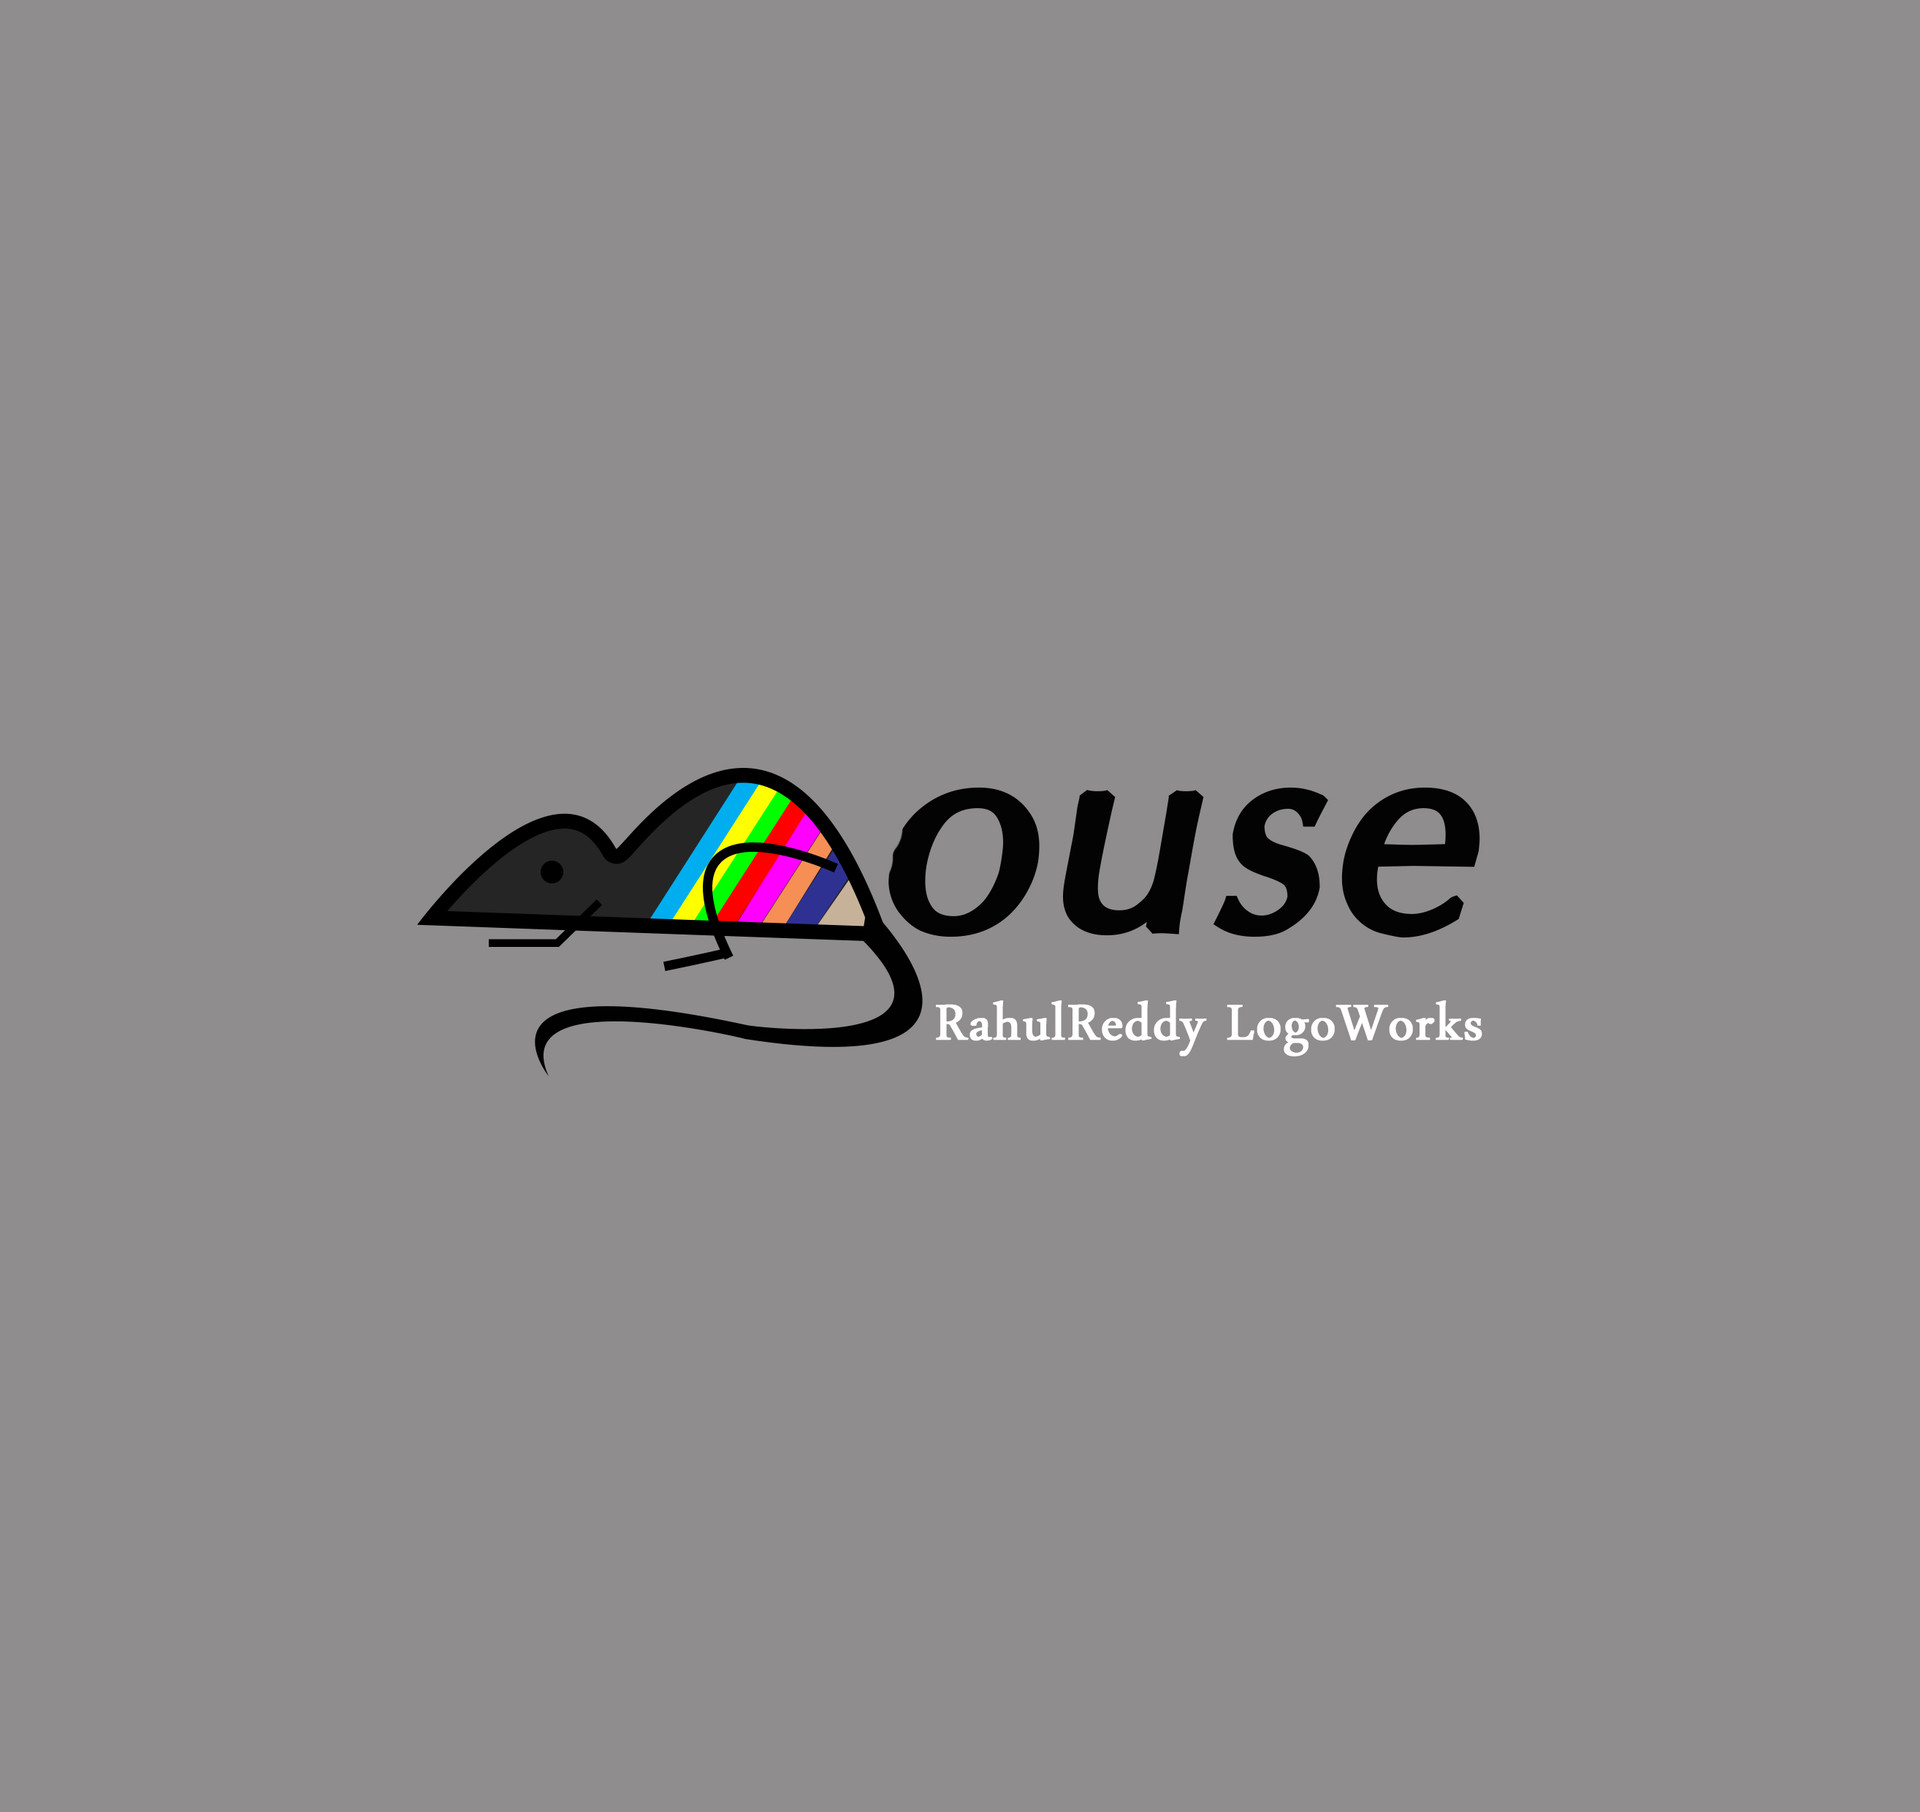 Rahul Reddy artist - logos